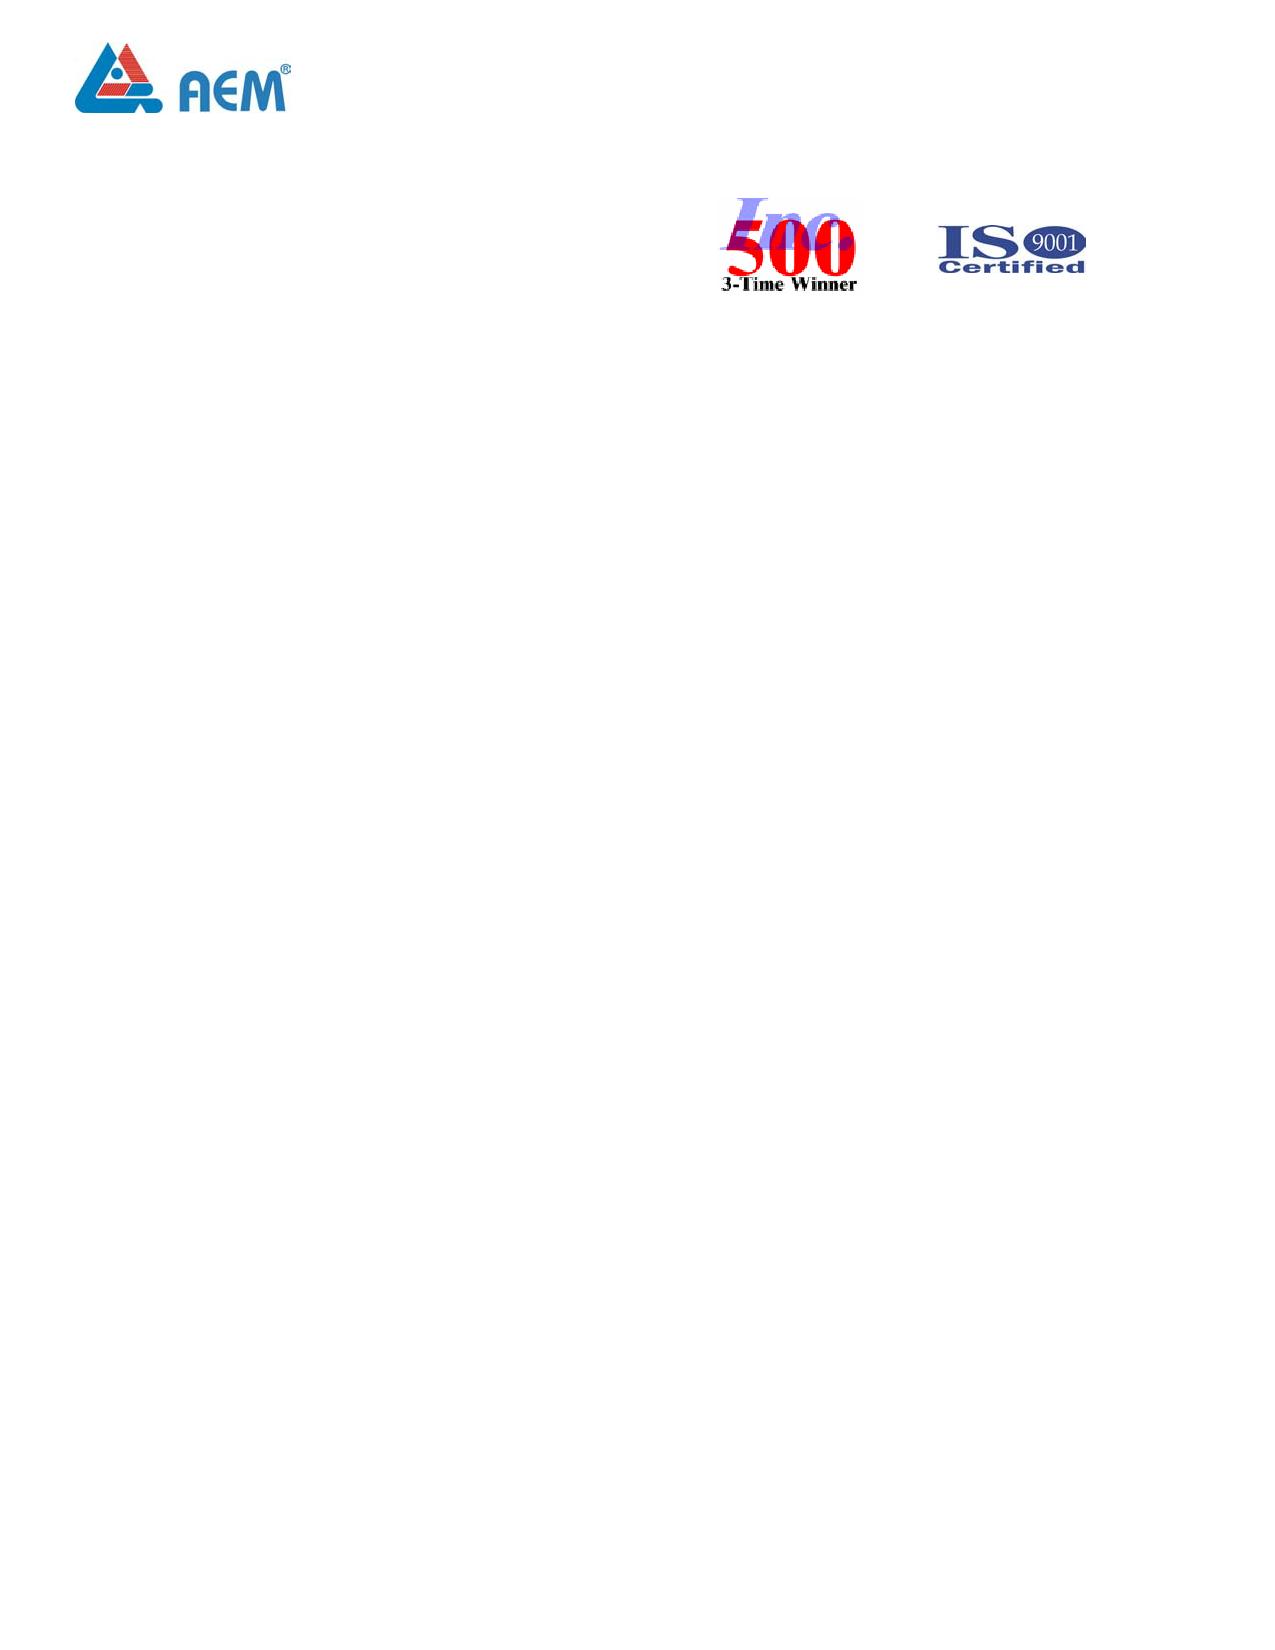 F0603FA1000V032T datasheet